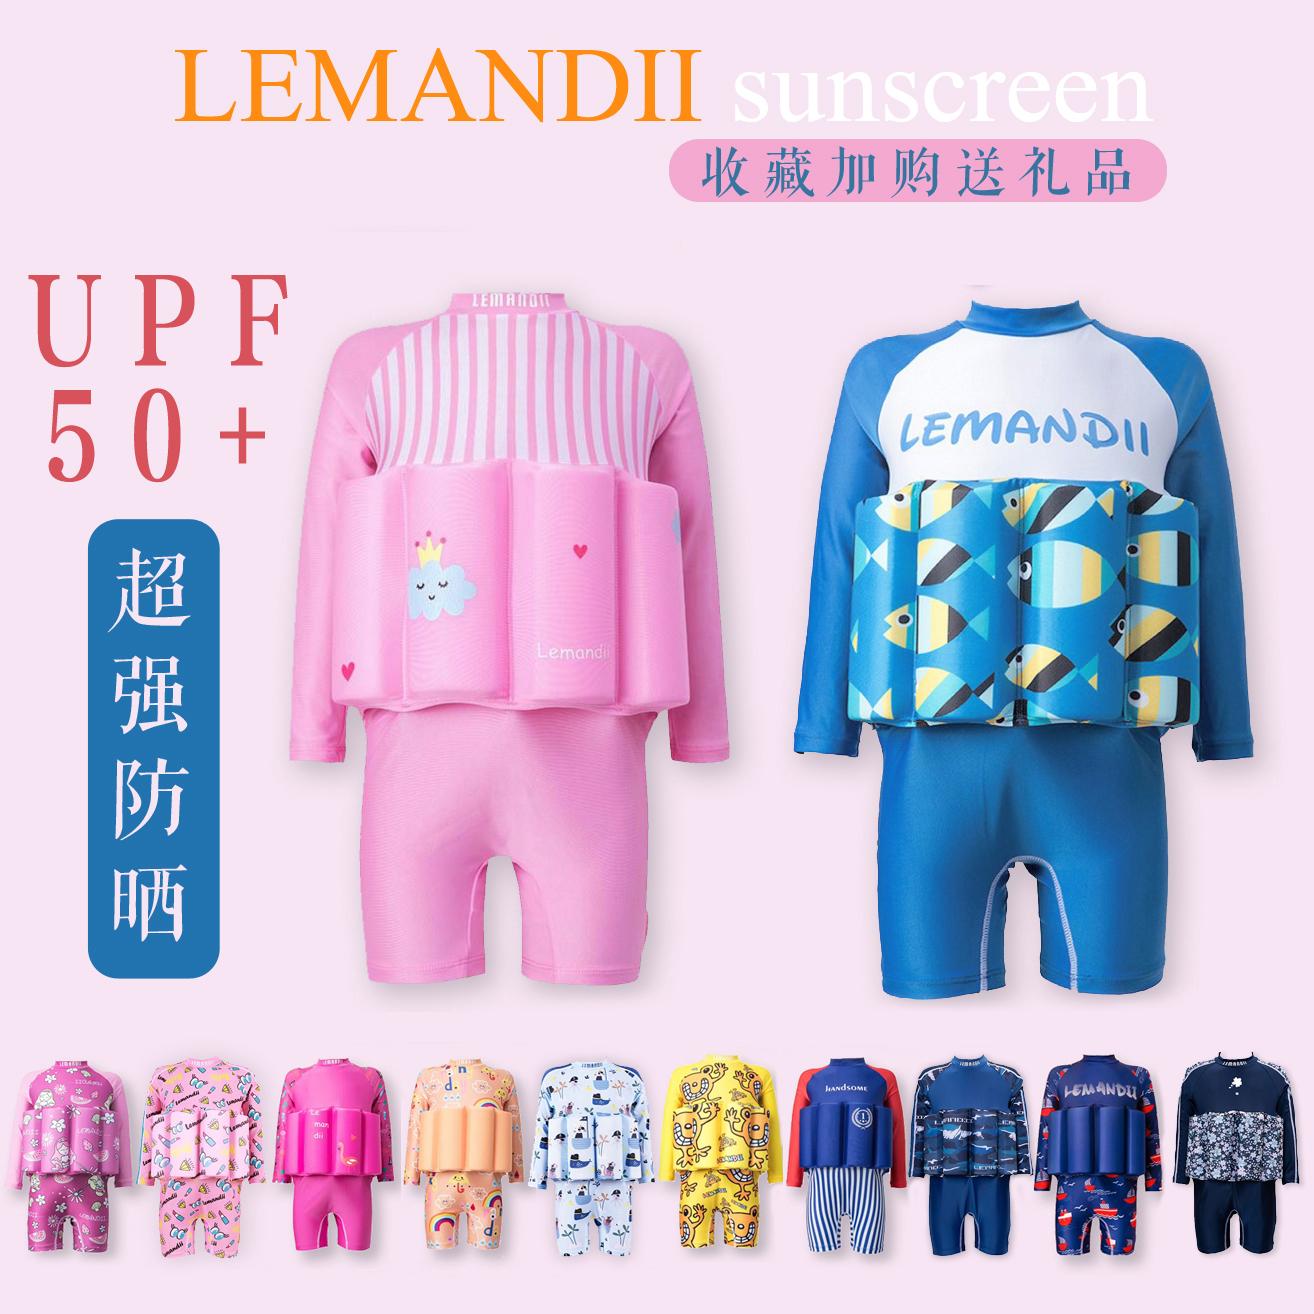 Lemandii Lemandi girls boys floating childrens one-piece sunscreen long sleeve Buoyancy Swimsuit